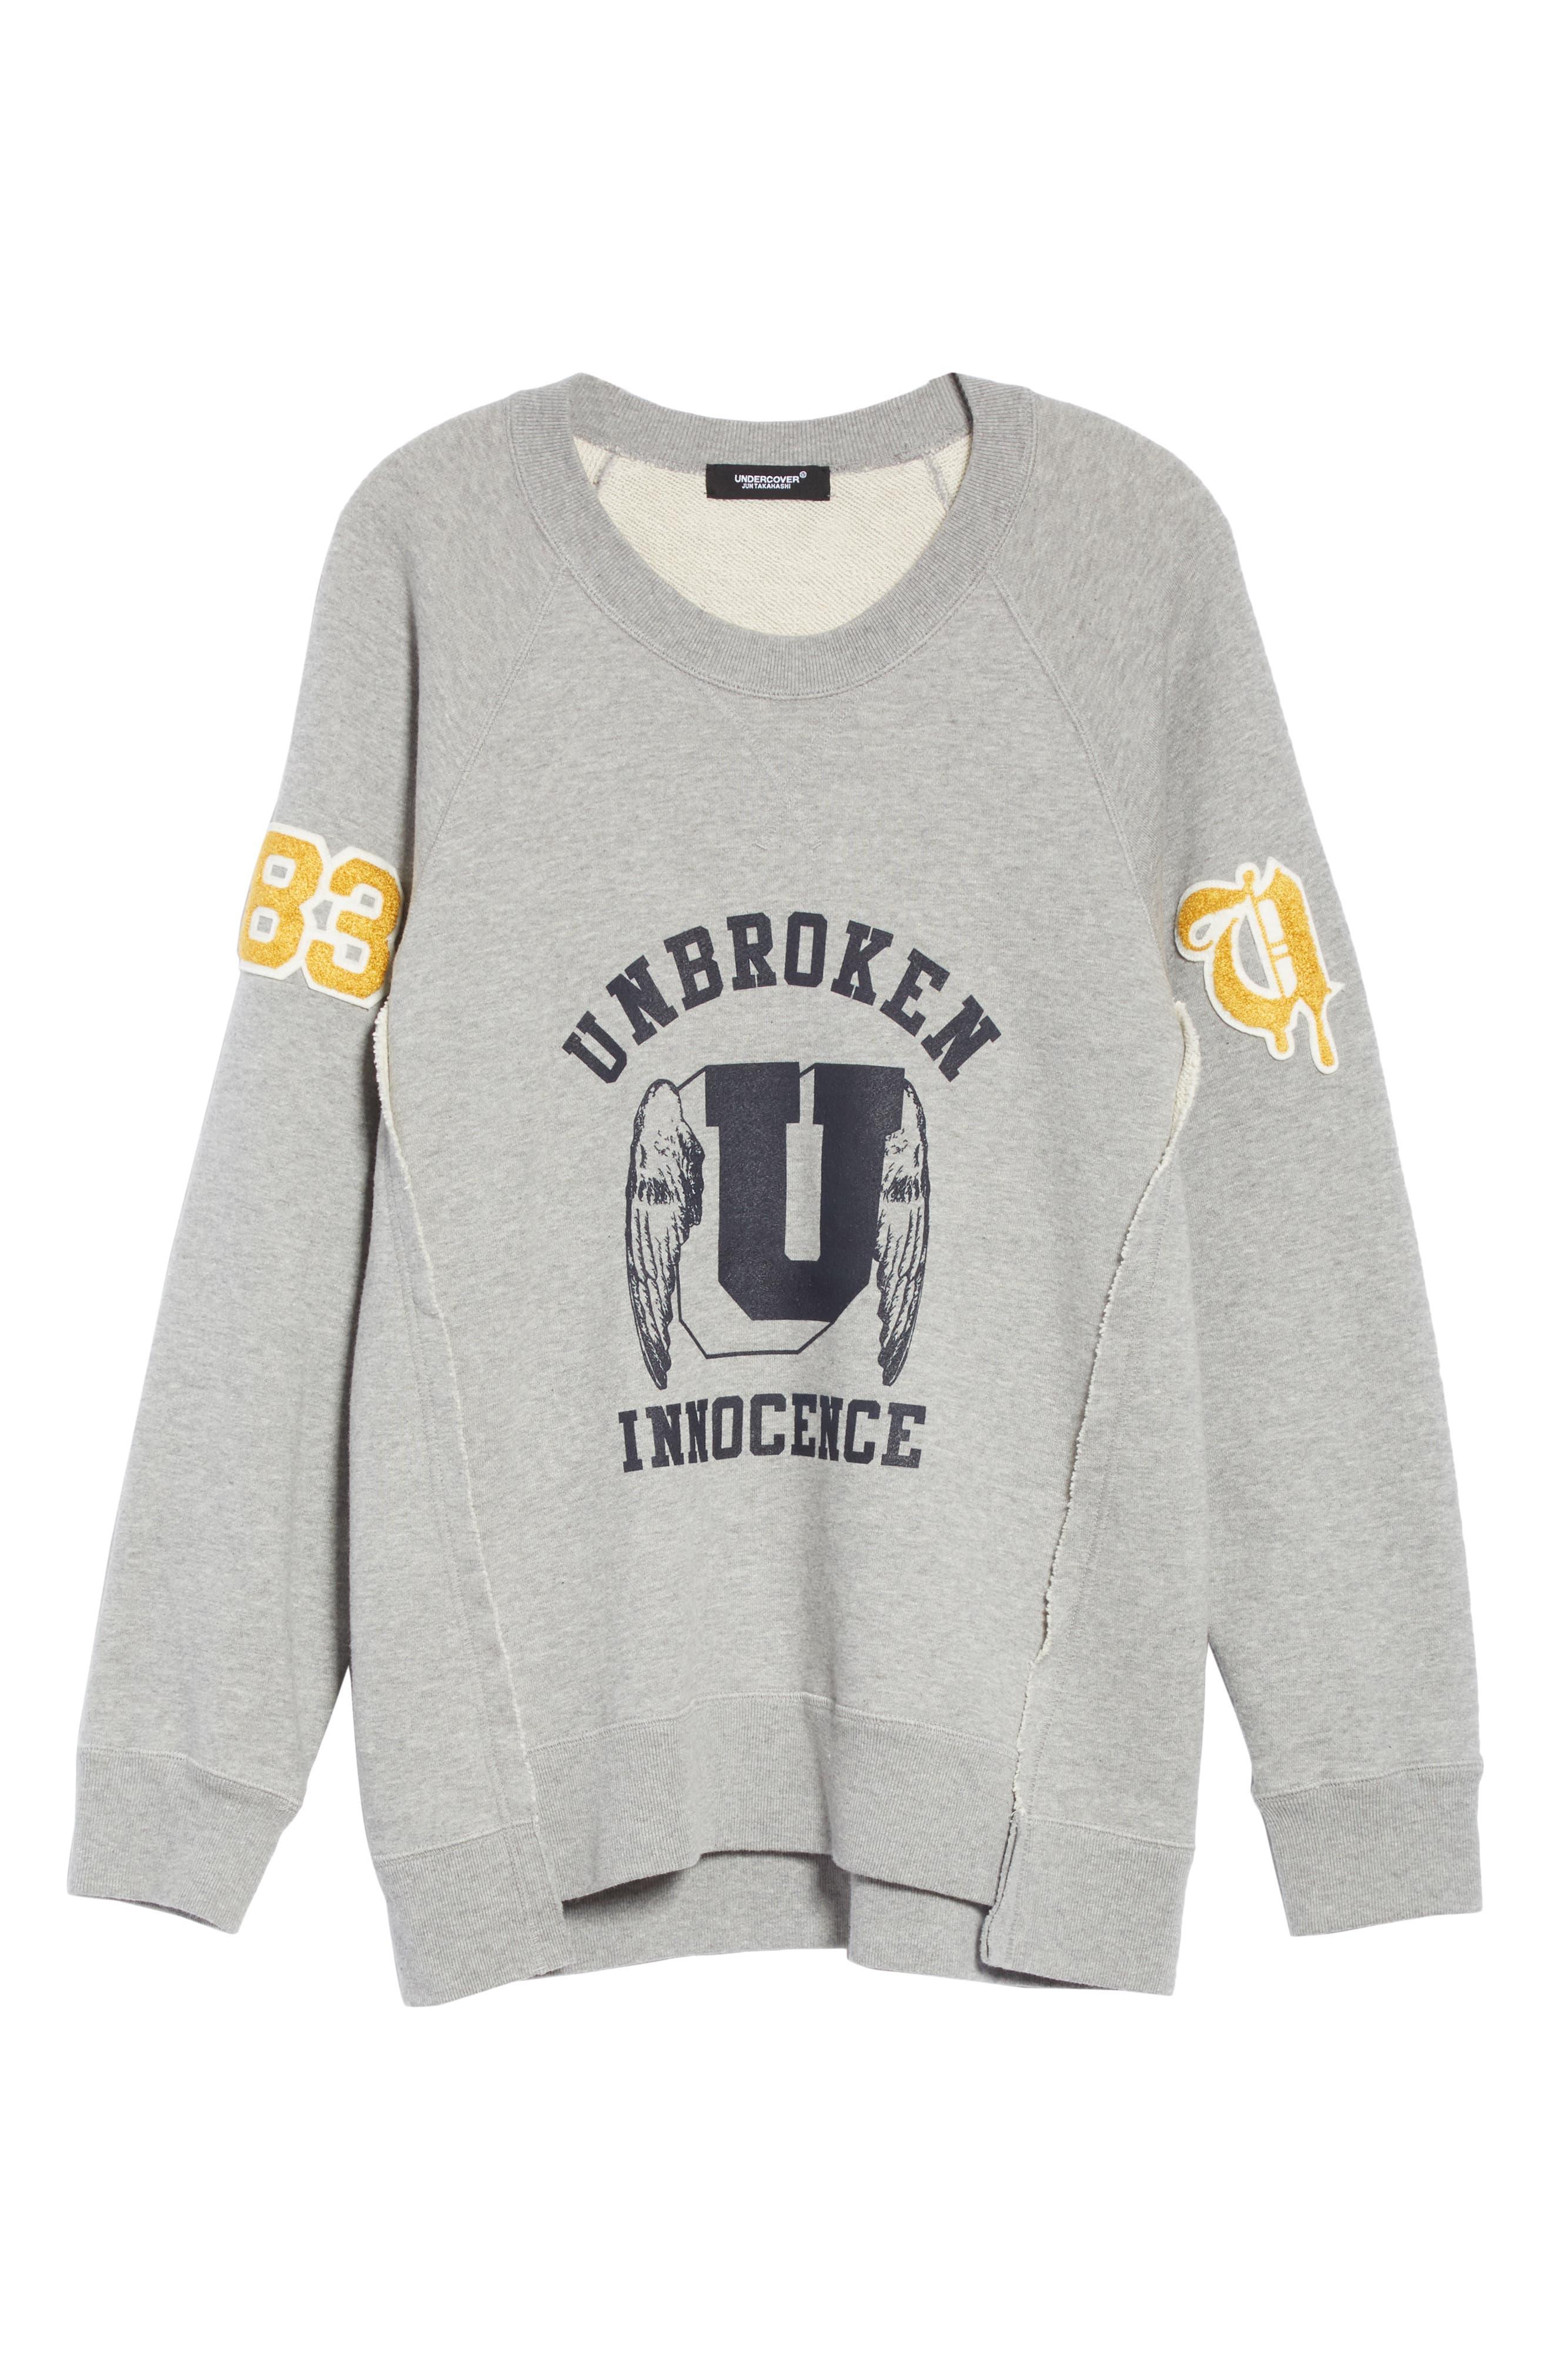 Unbroken Innocence Sweatshirt,                             Alternate thumbnail 6, color,                             B TOP GRAY